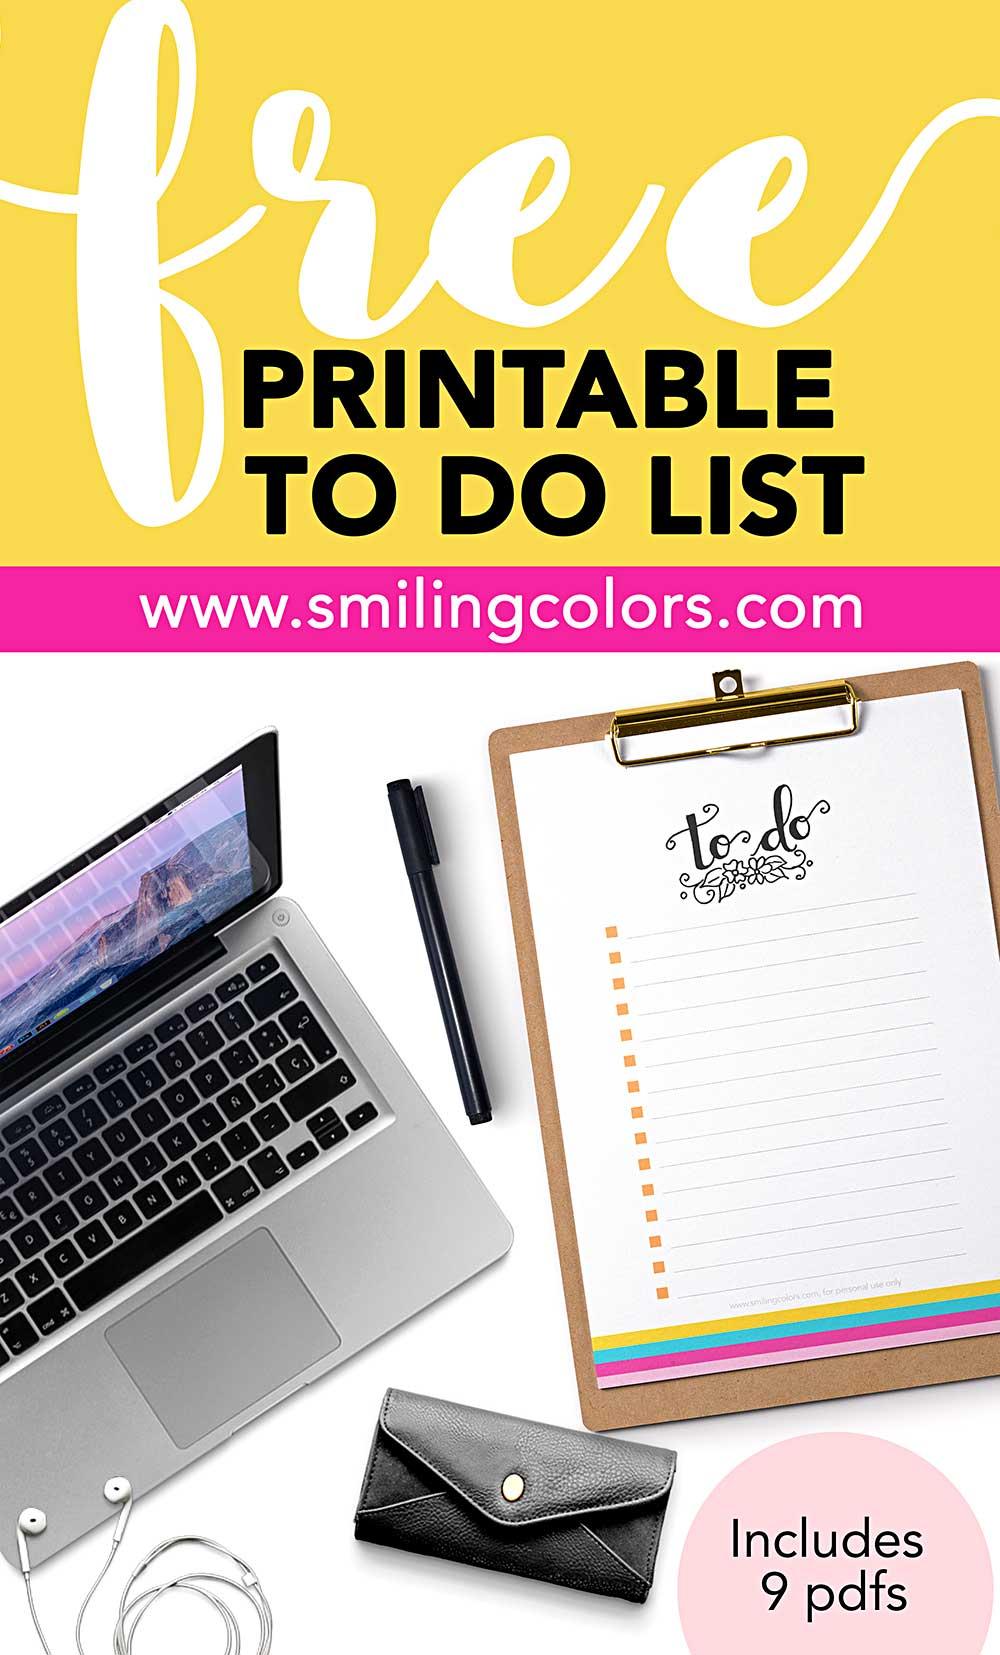 print to do list